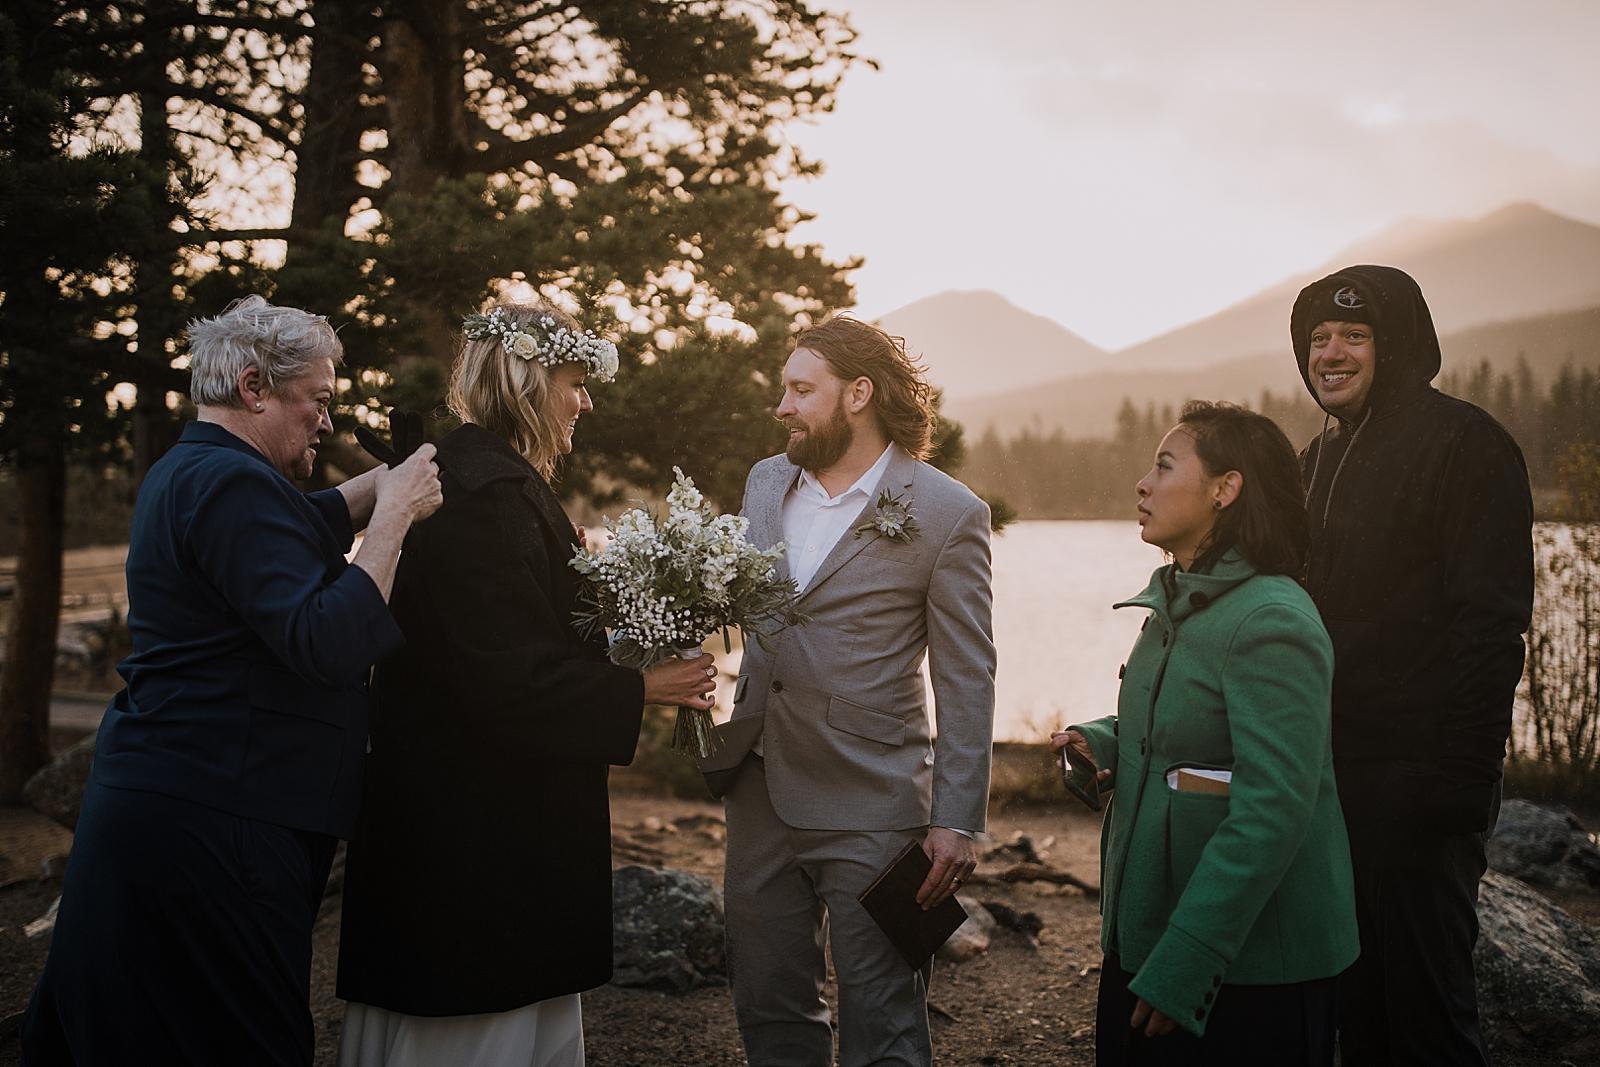 elopement celebration, sprague lake dock elopement, sunrise elopement, colorado elopement, sprague lake elopement, rocky mountain national park elopement, adventurous colorado hiking elopement